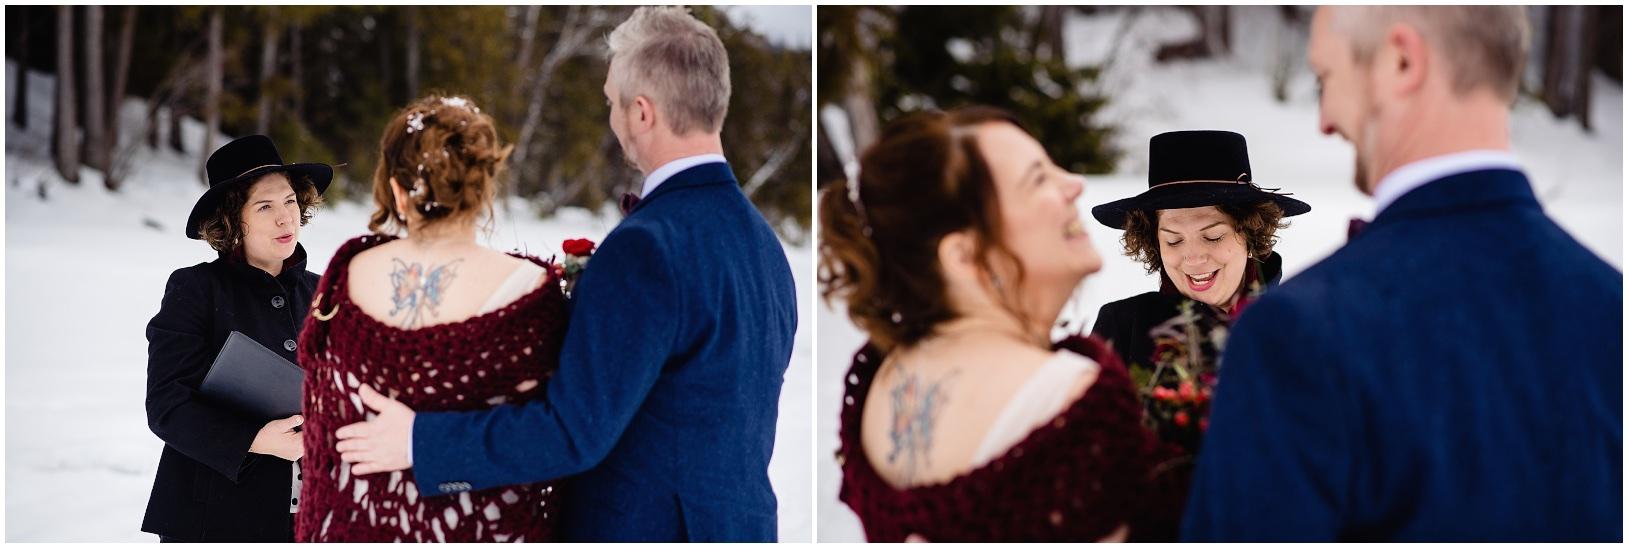 lindseyjanephotography_elopement039.jpg